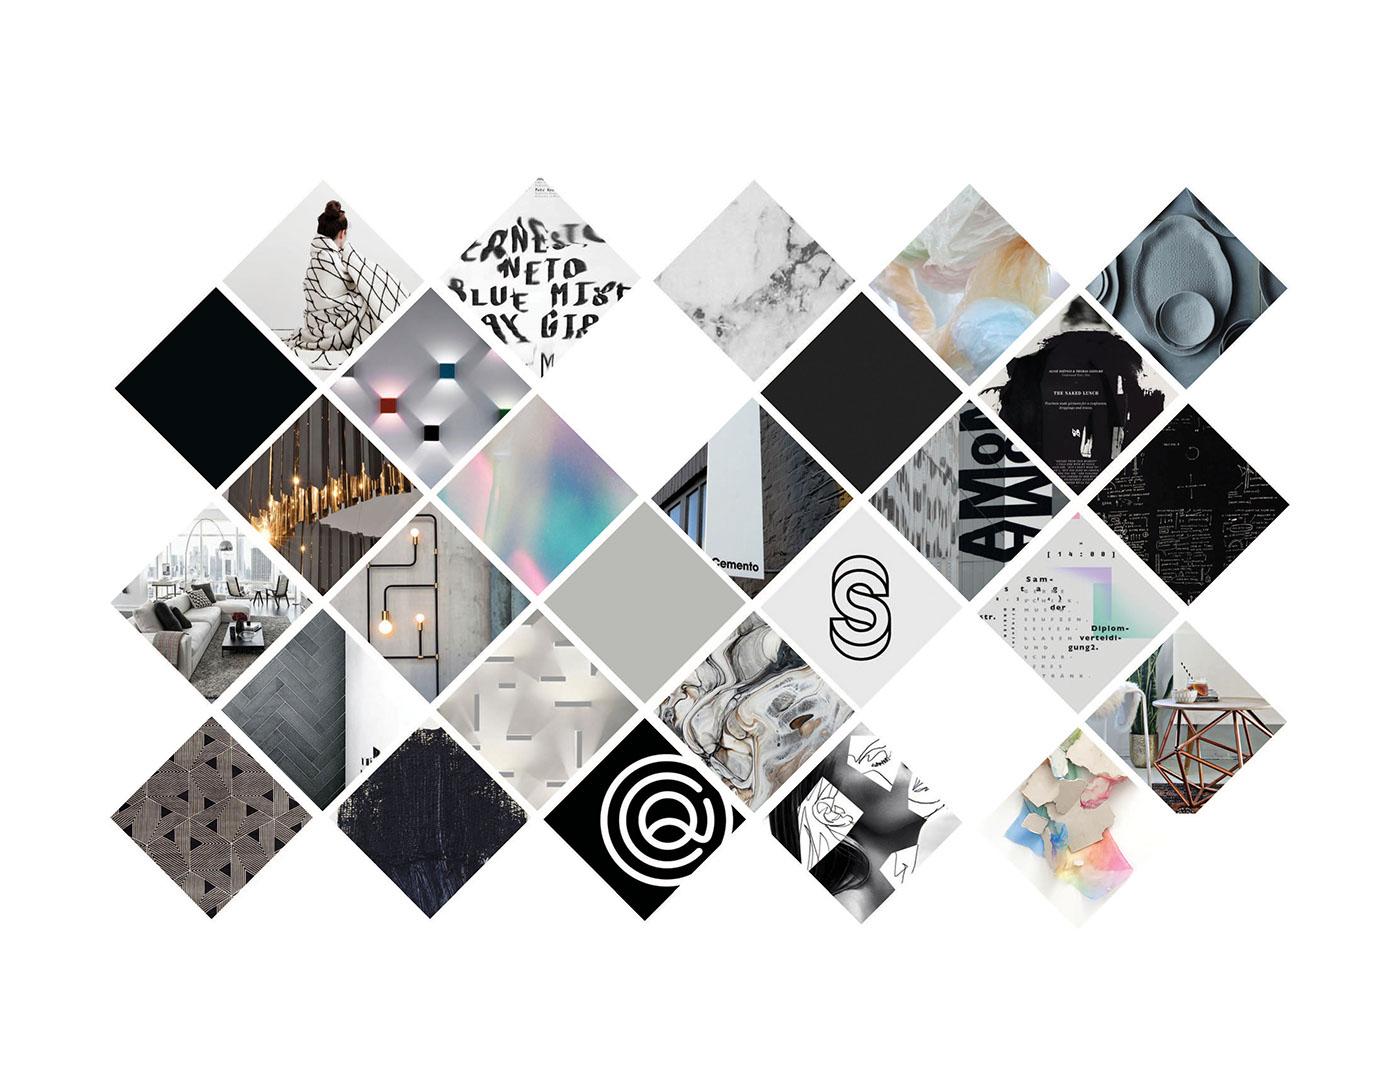 Corporate Identity brand jepson center Savannah museum identity SCAD visual identity iridescent color Stationery sleek modern holographic foil contemporary